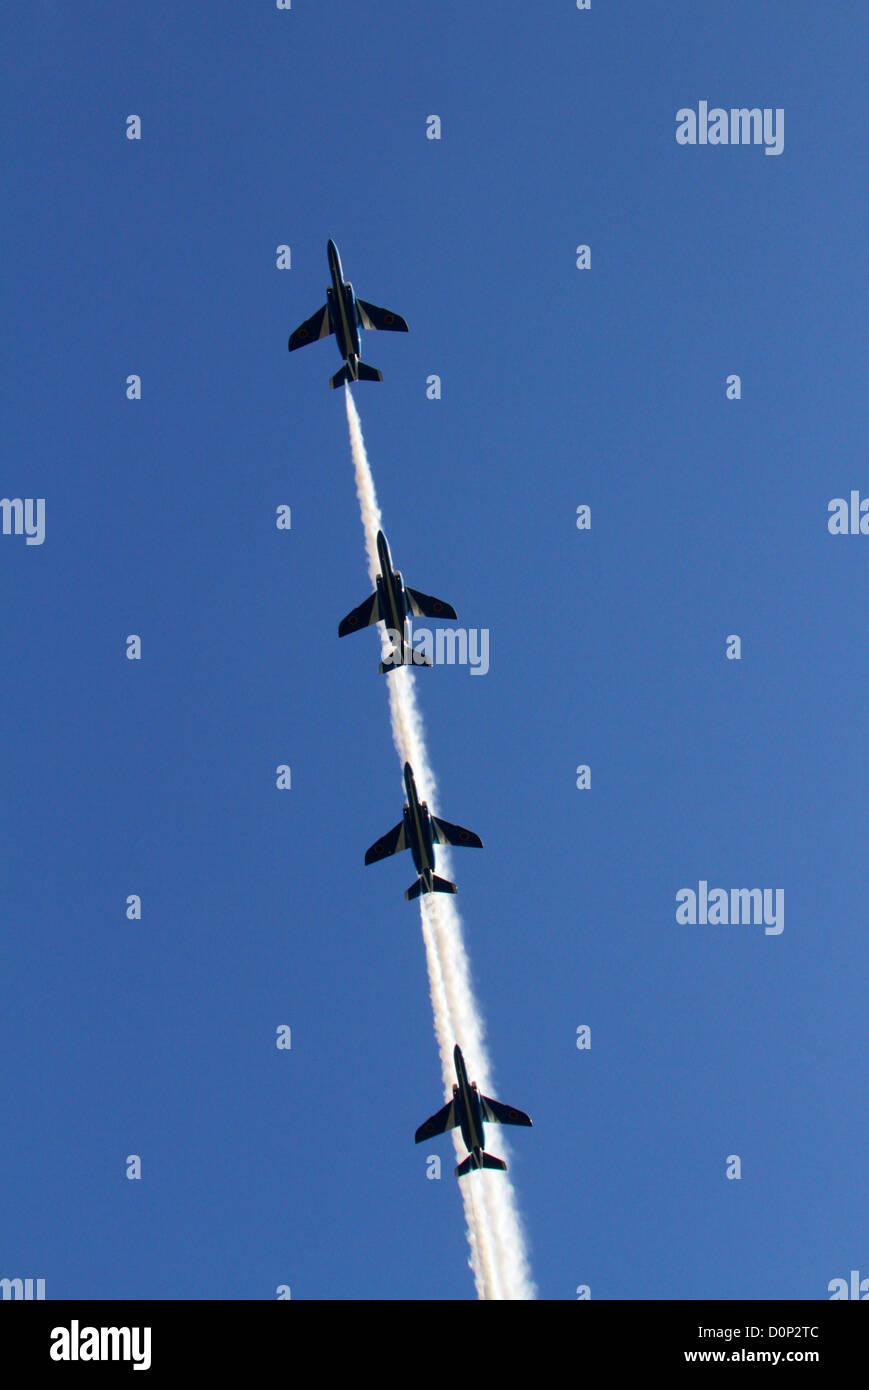 The Blue Impulse aerobatic display Japan - Stock Image